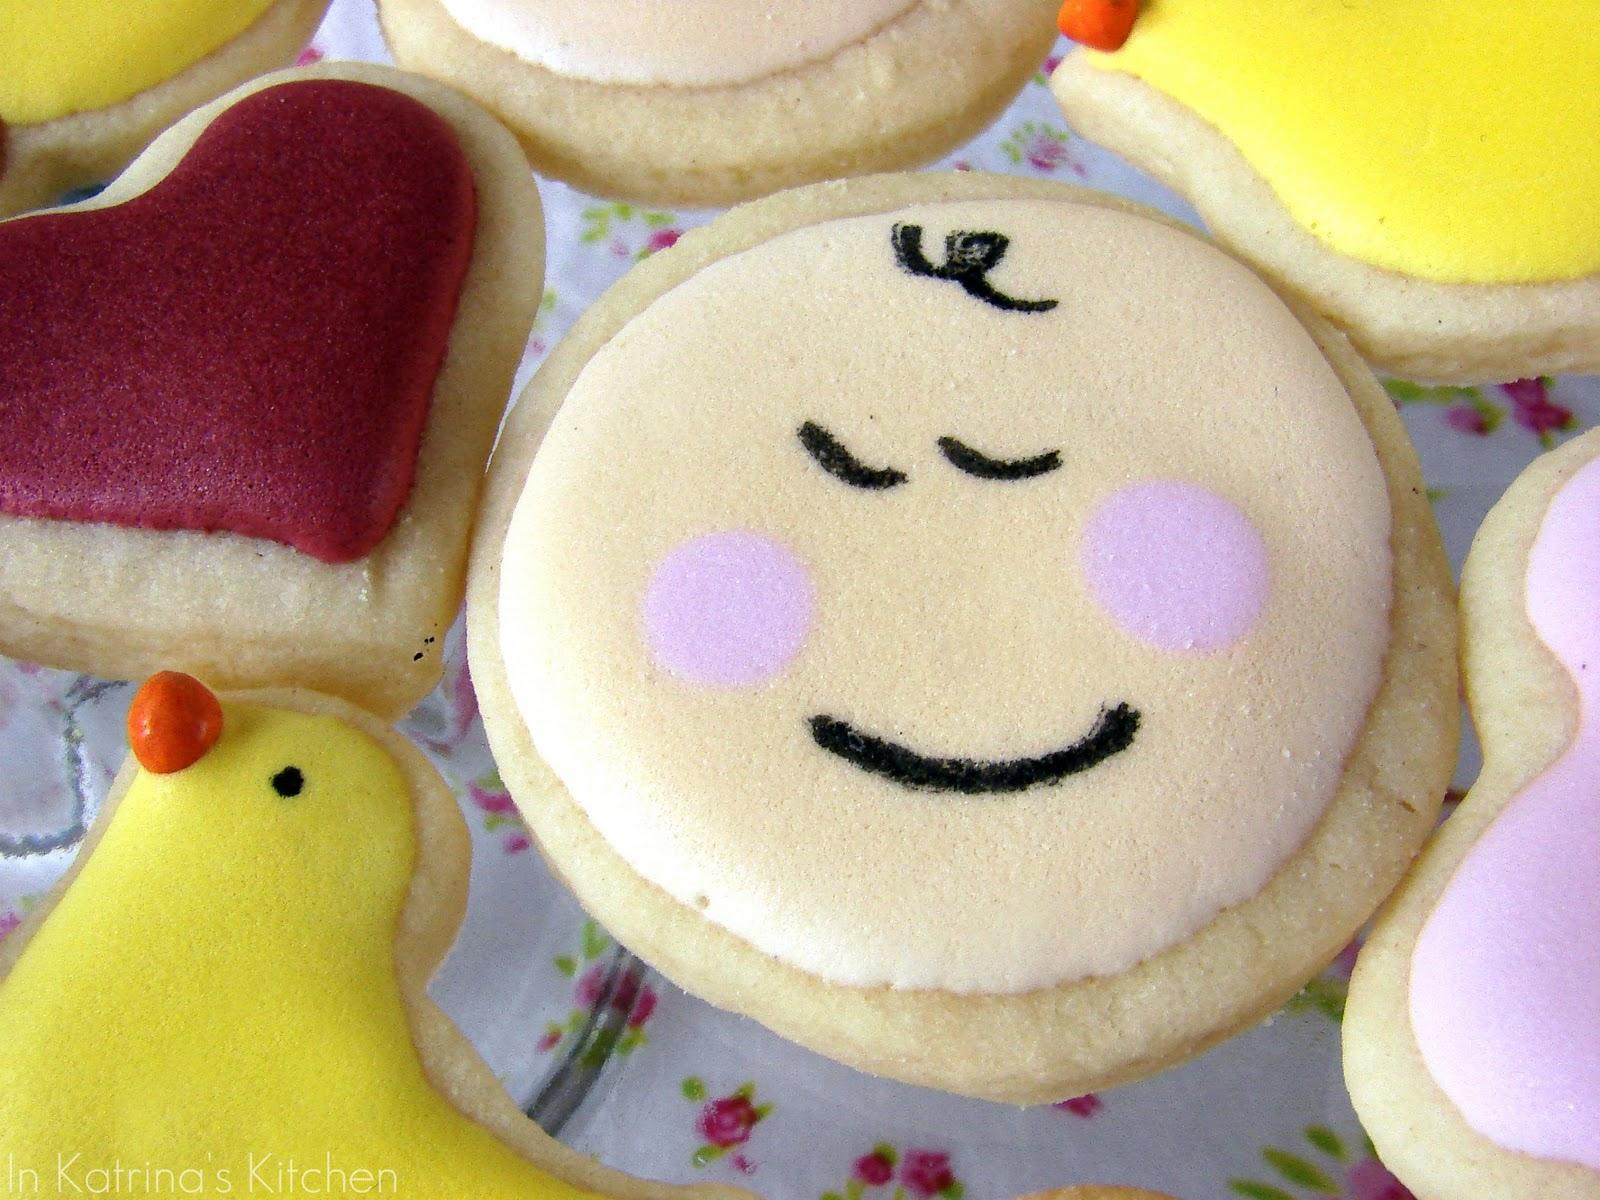 DIY baby face cookies